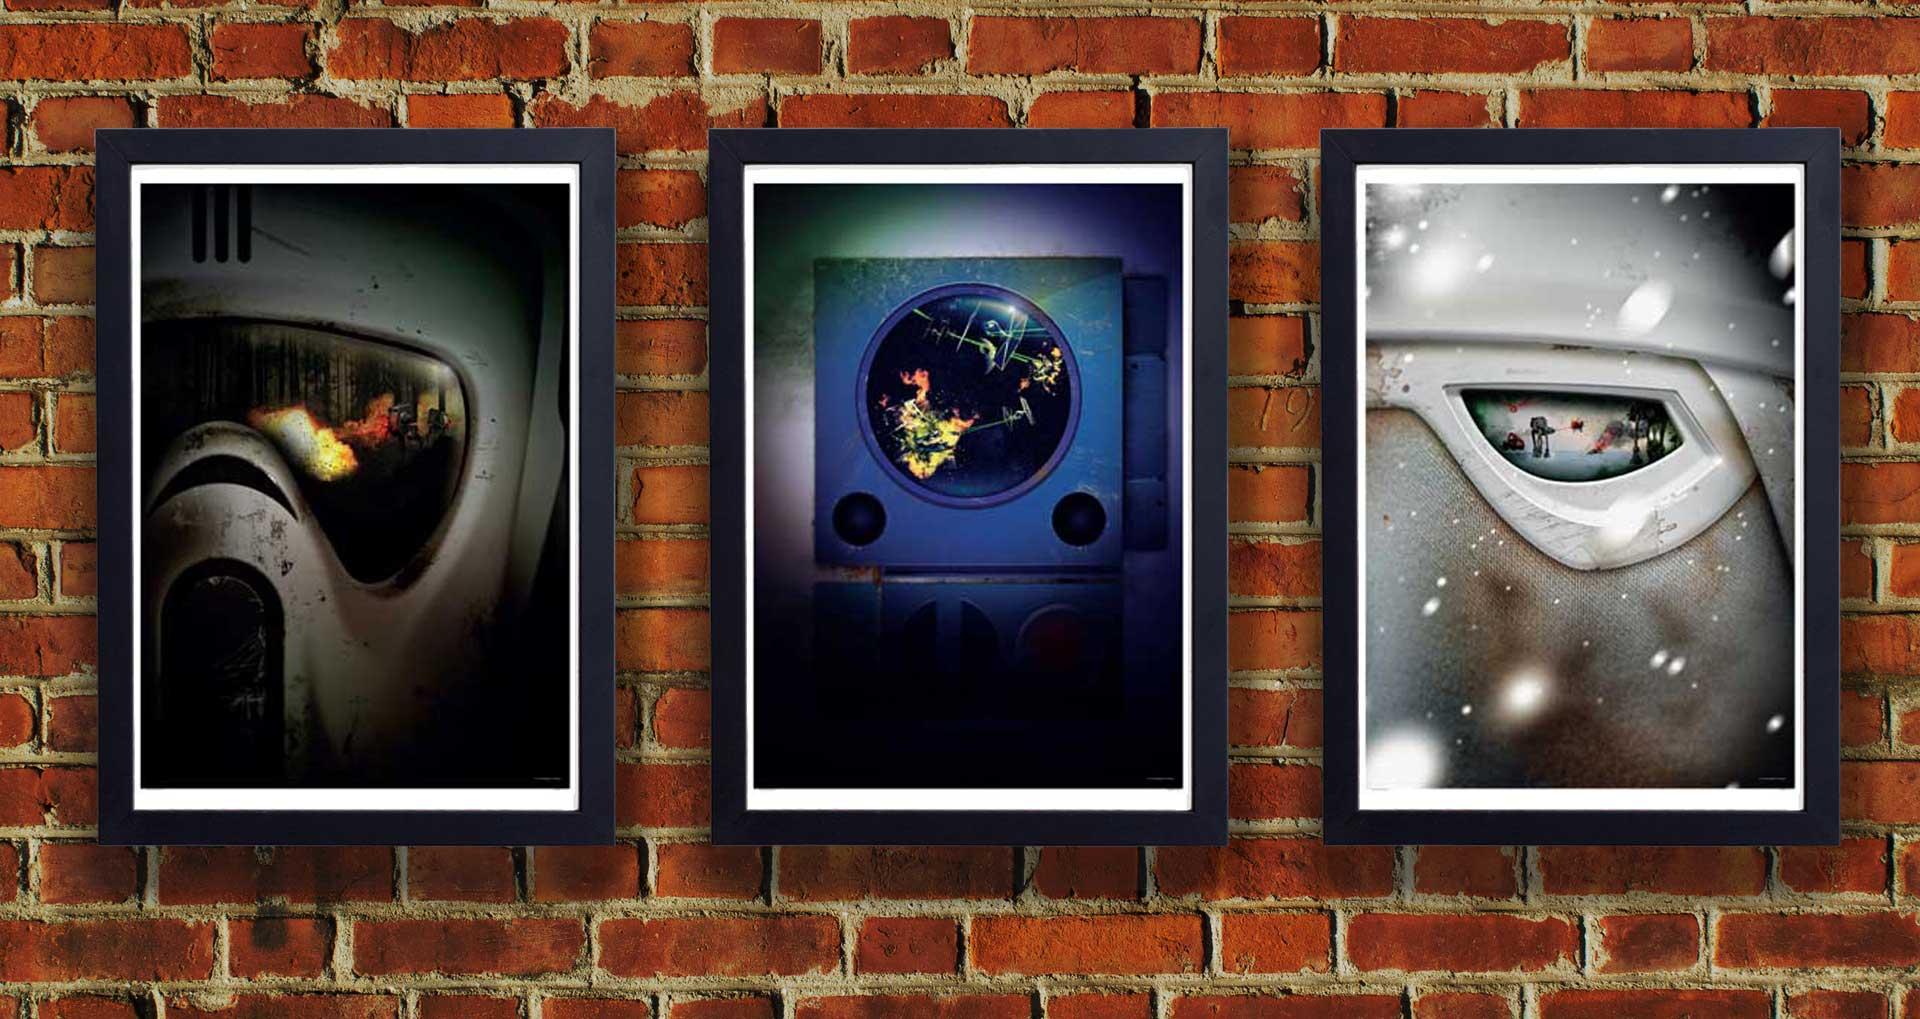 starwars-vision-trio-image.jpg